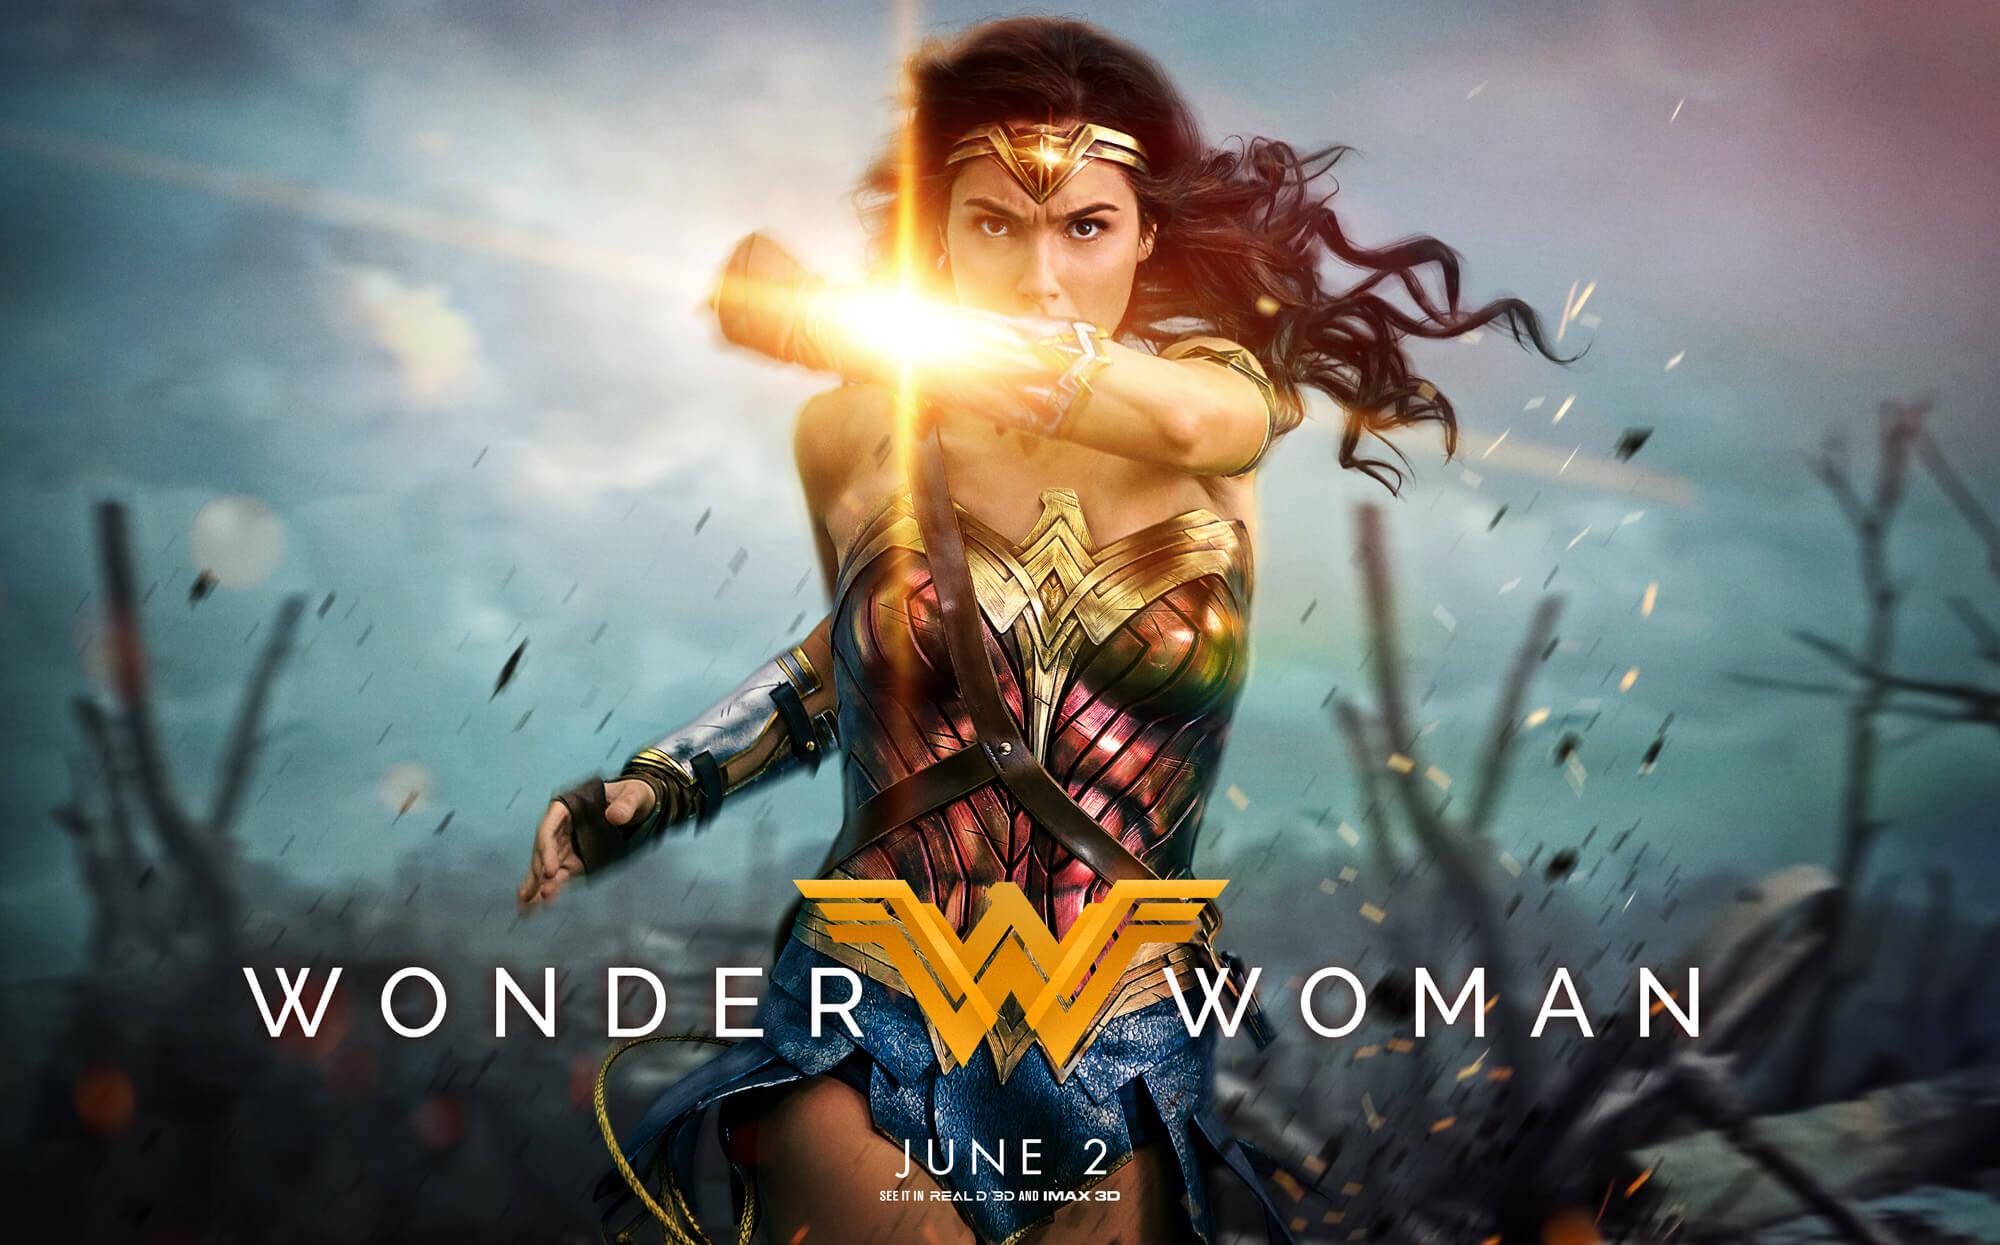 See Gal Gadot Wield Her Lasso In Final 'Wonder Woman' Trailer